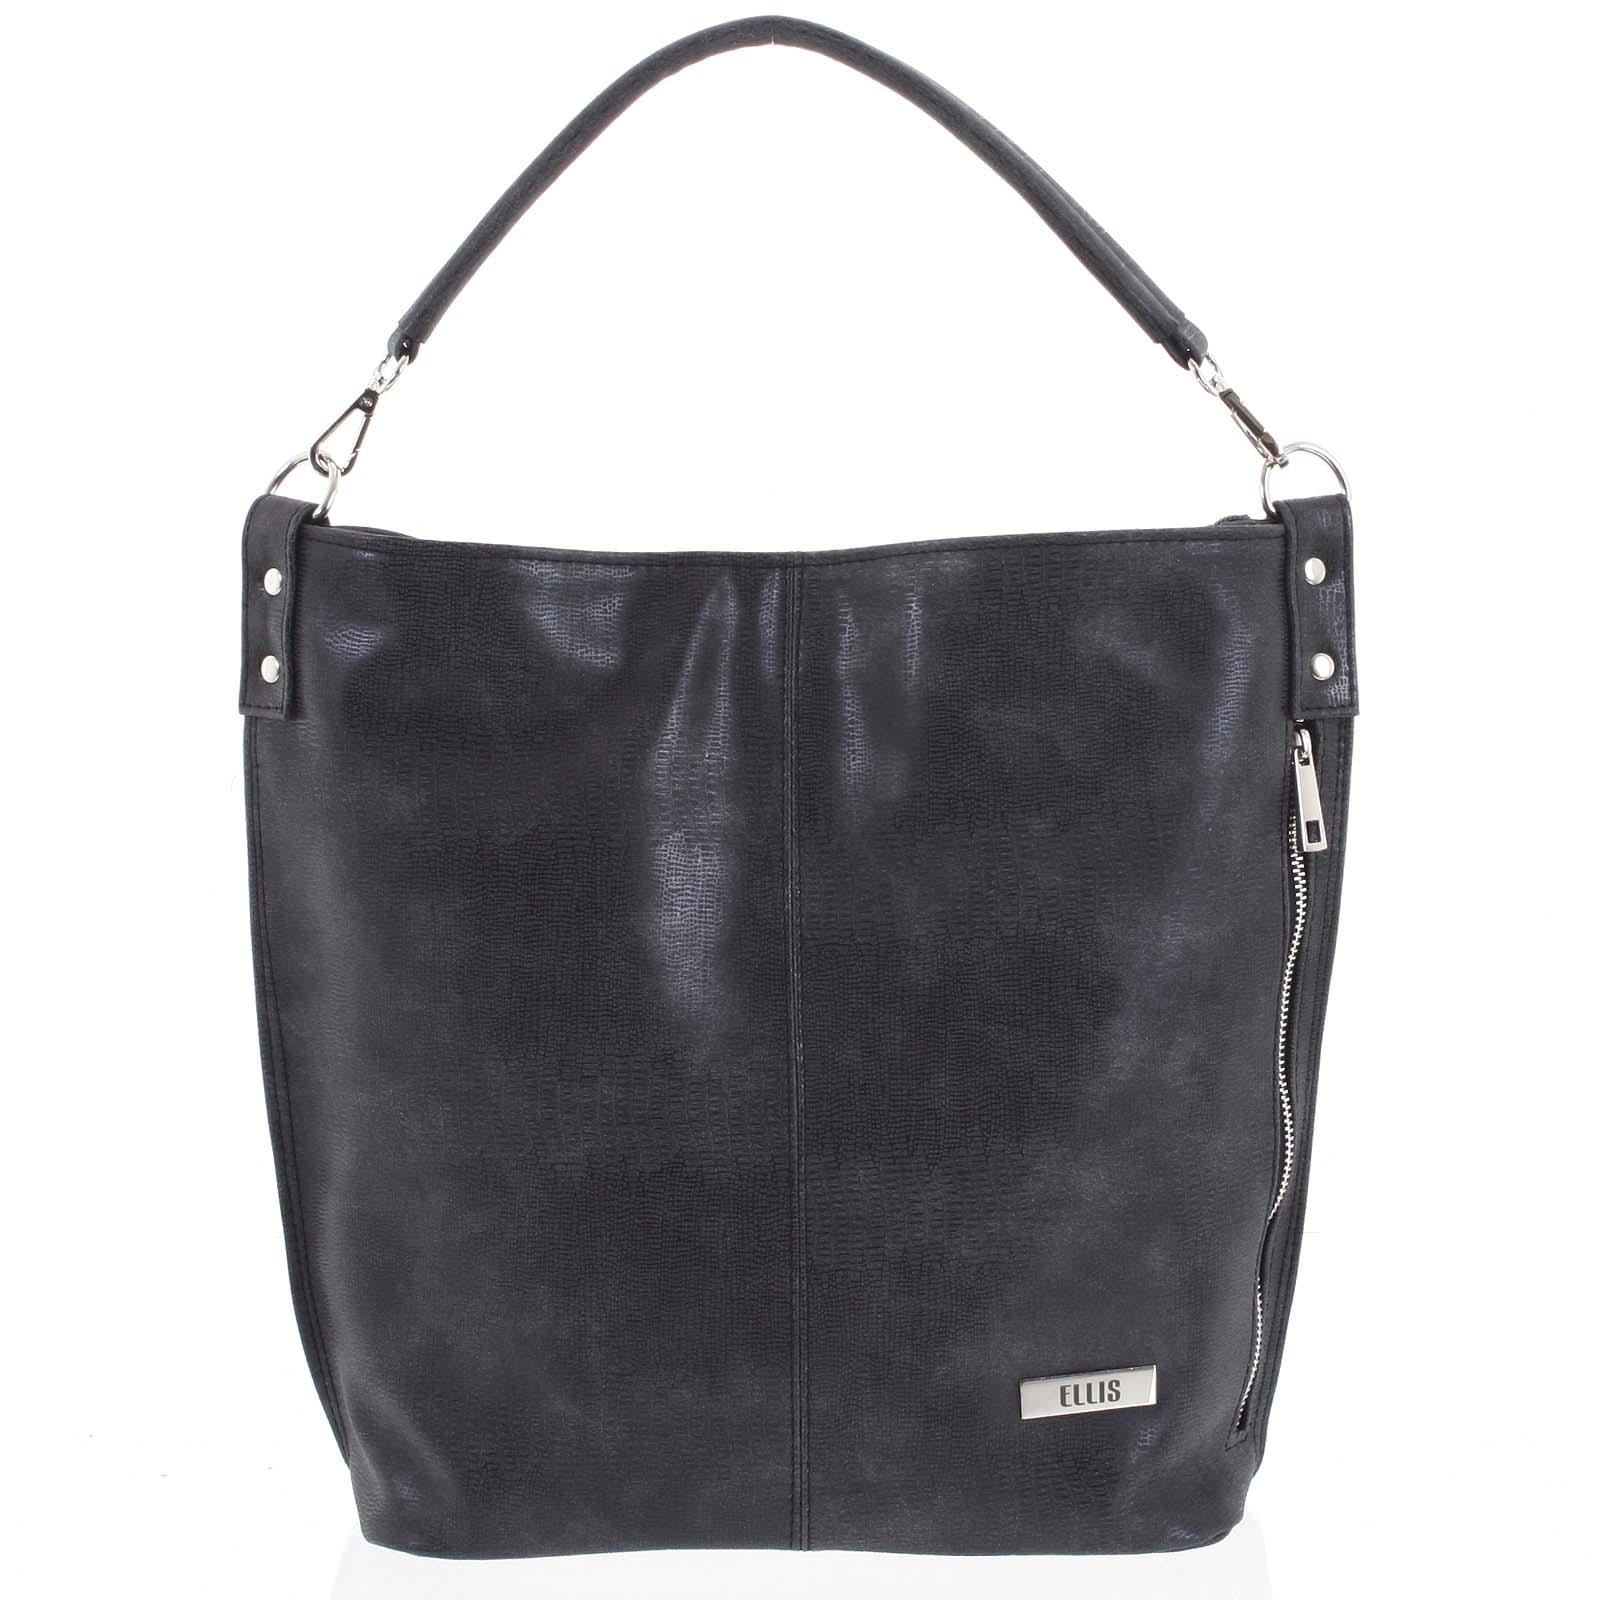 Elegantná dámska kabelka cez rameno tmavo šedá so vzorom - Ellis Negina